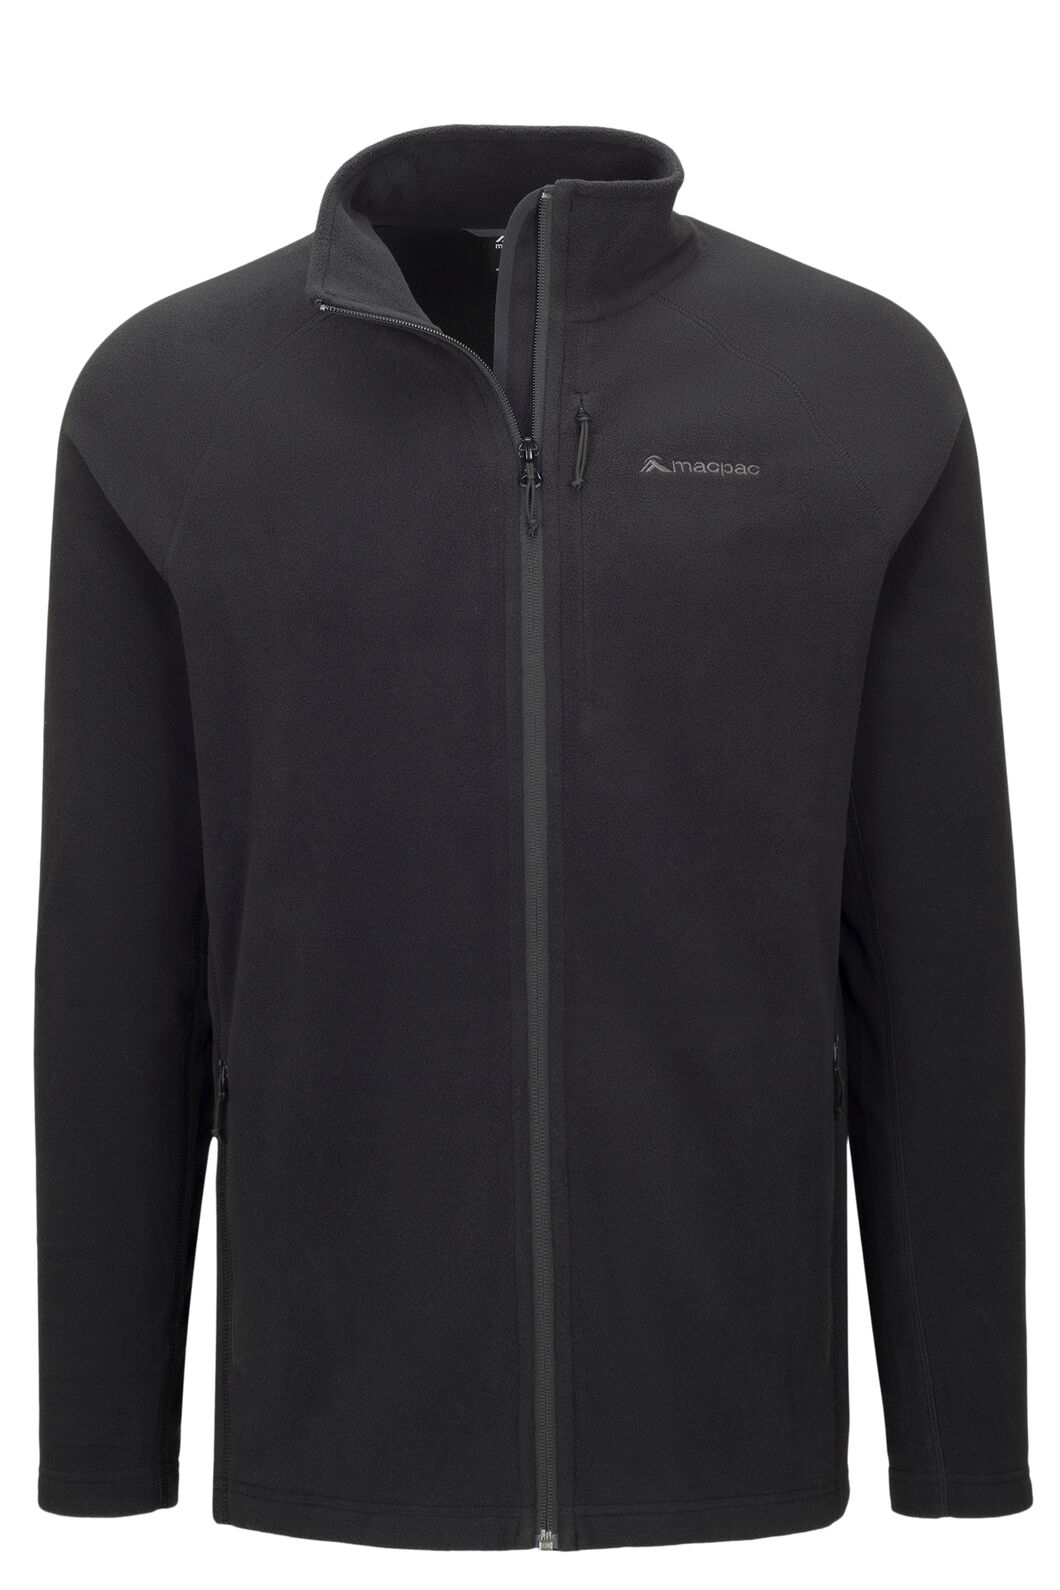 Macpac Men's Tui Polartec® Micro Fleece® Jacket, Black, hi-res